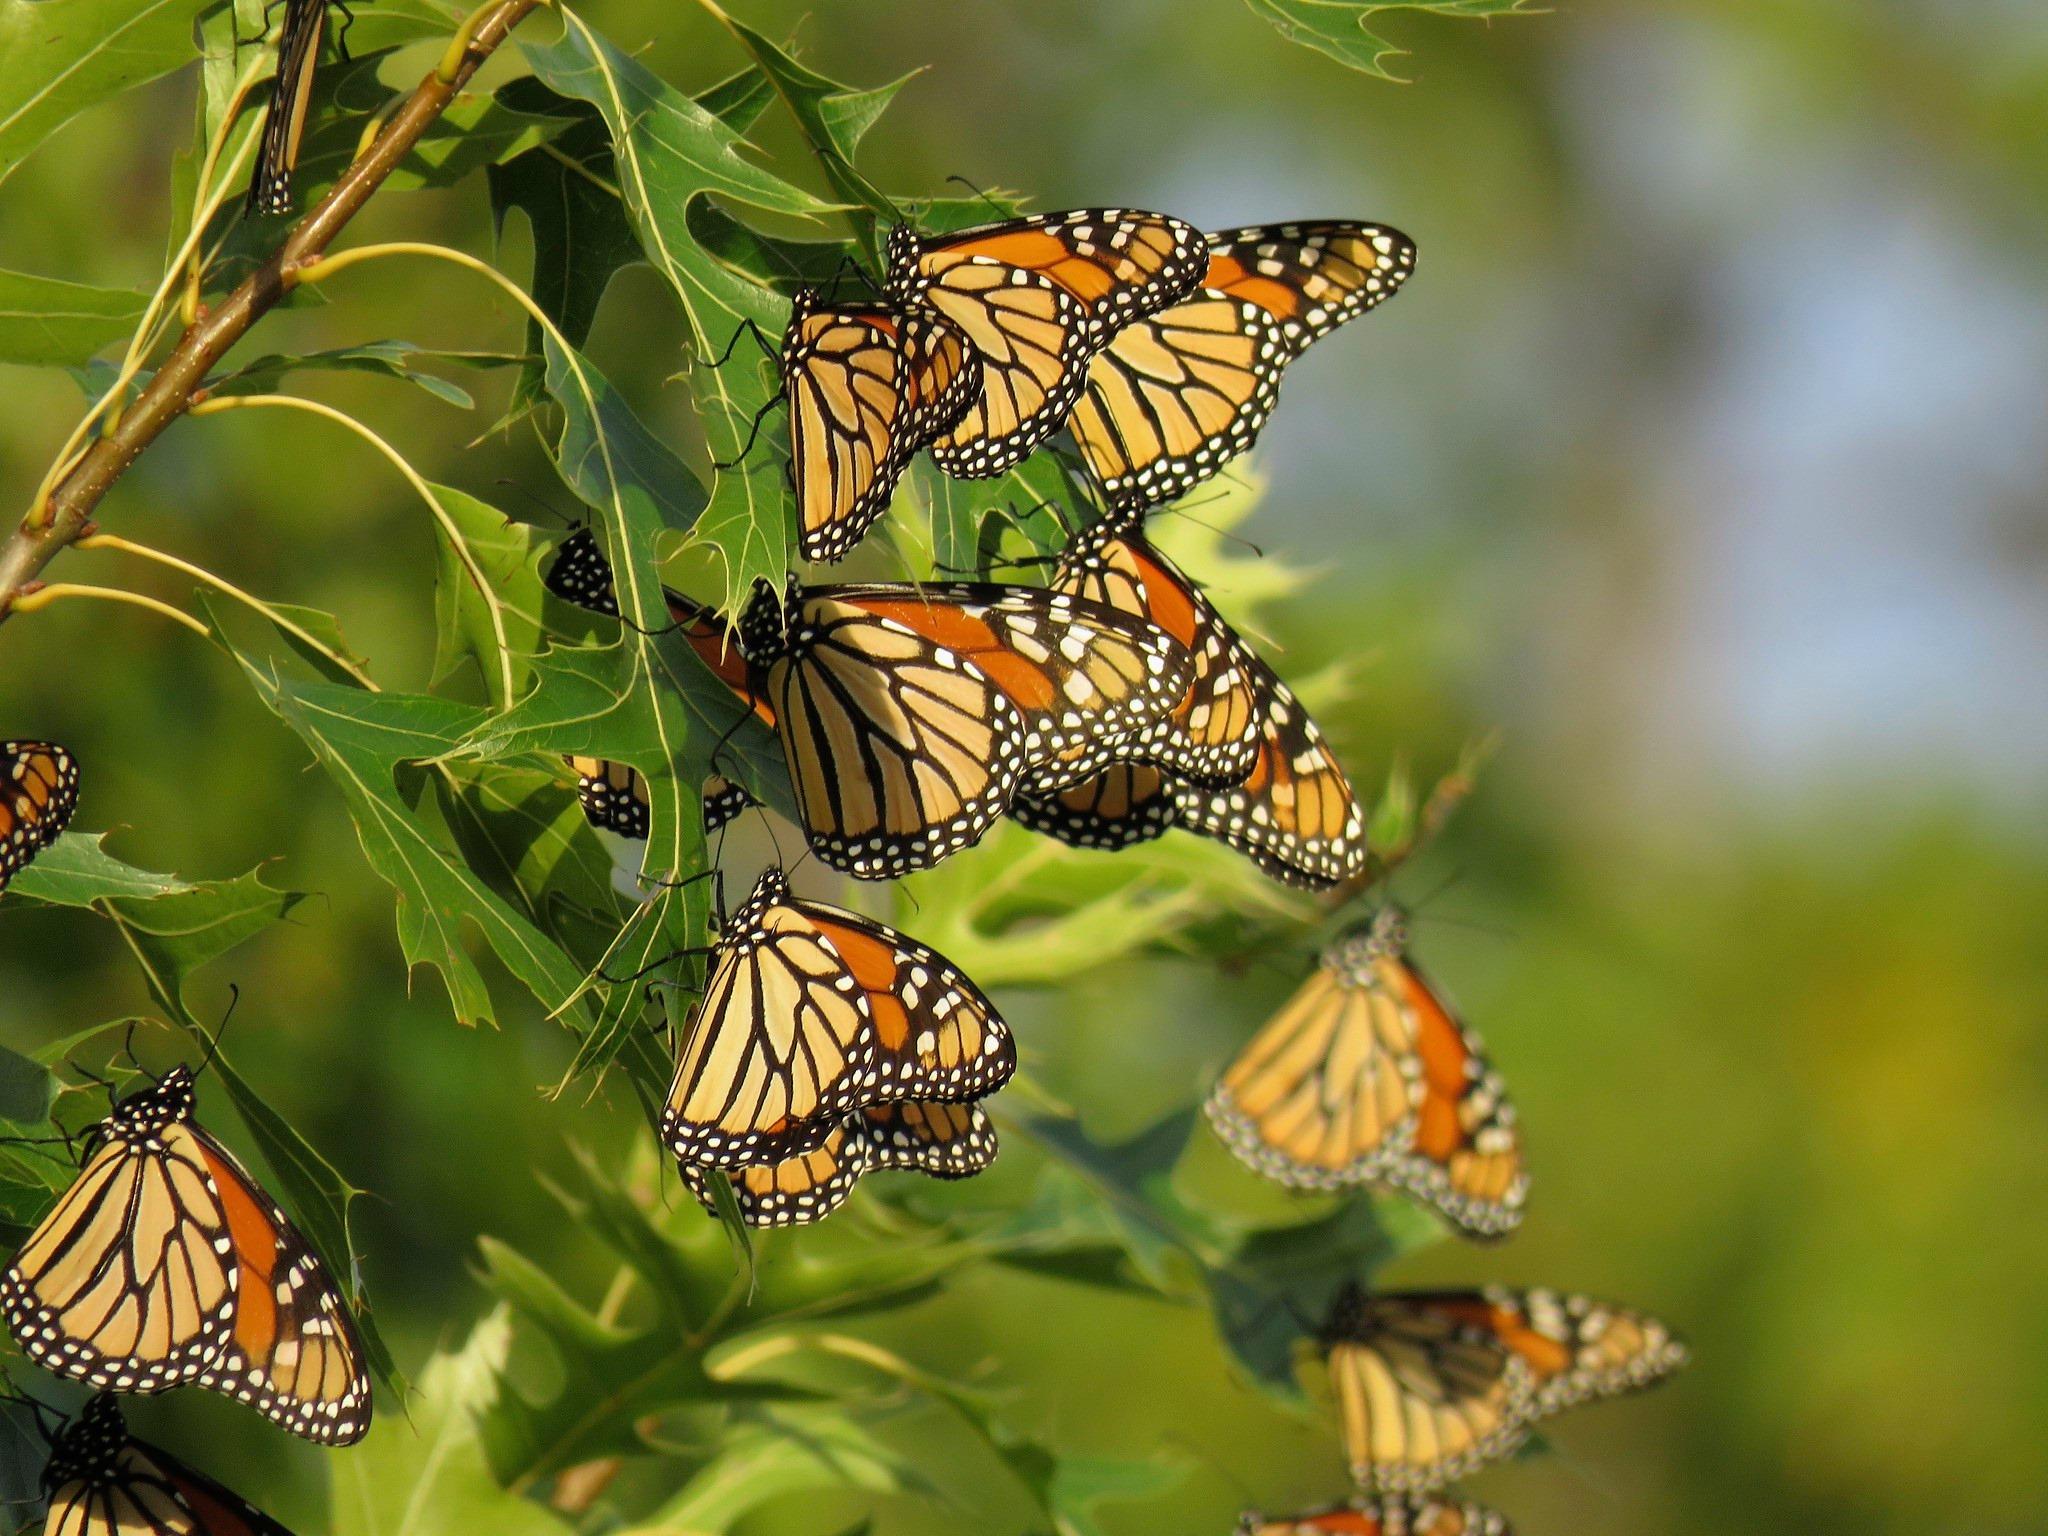 Big Oaks National Wildlife Refuge Incorporating Climate